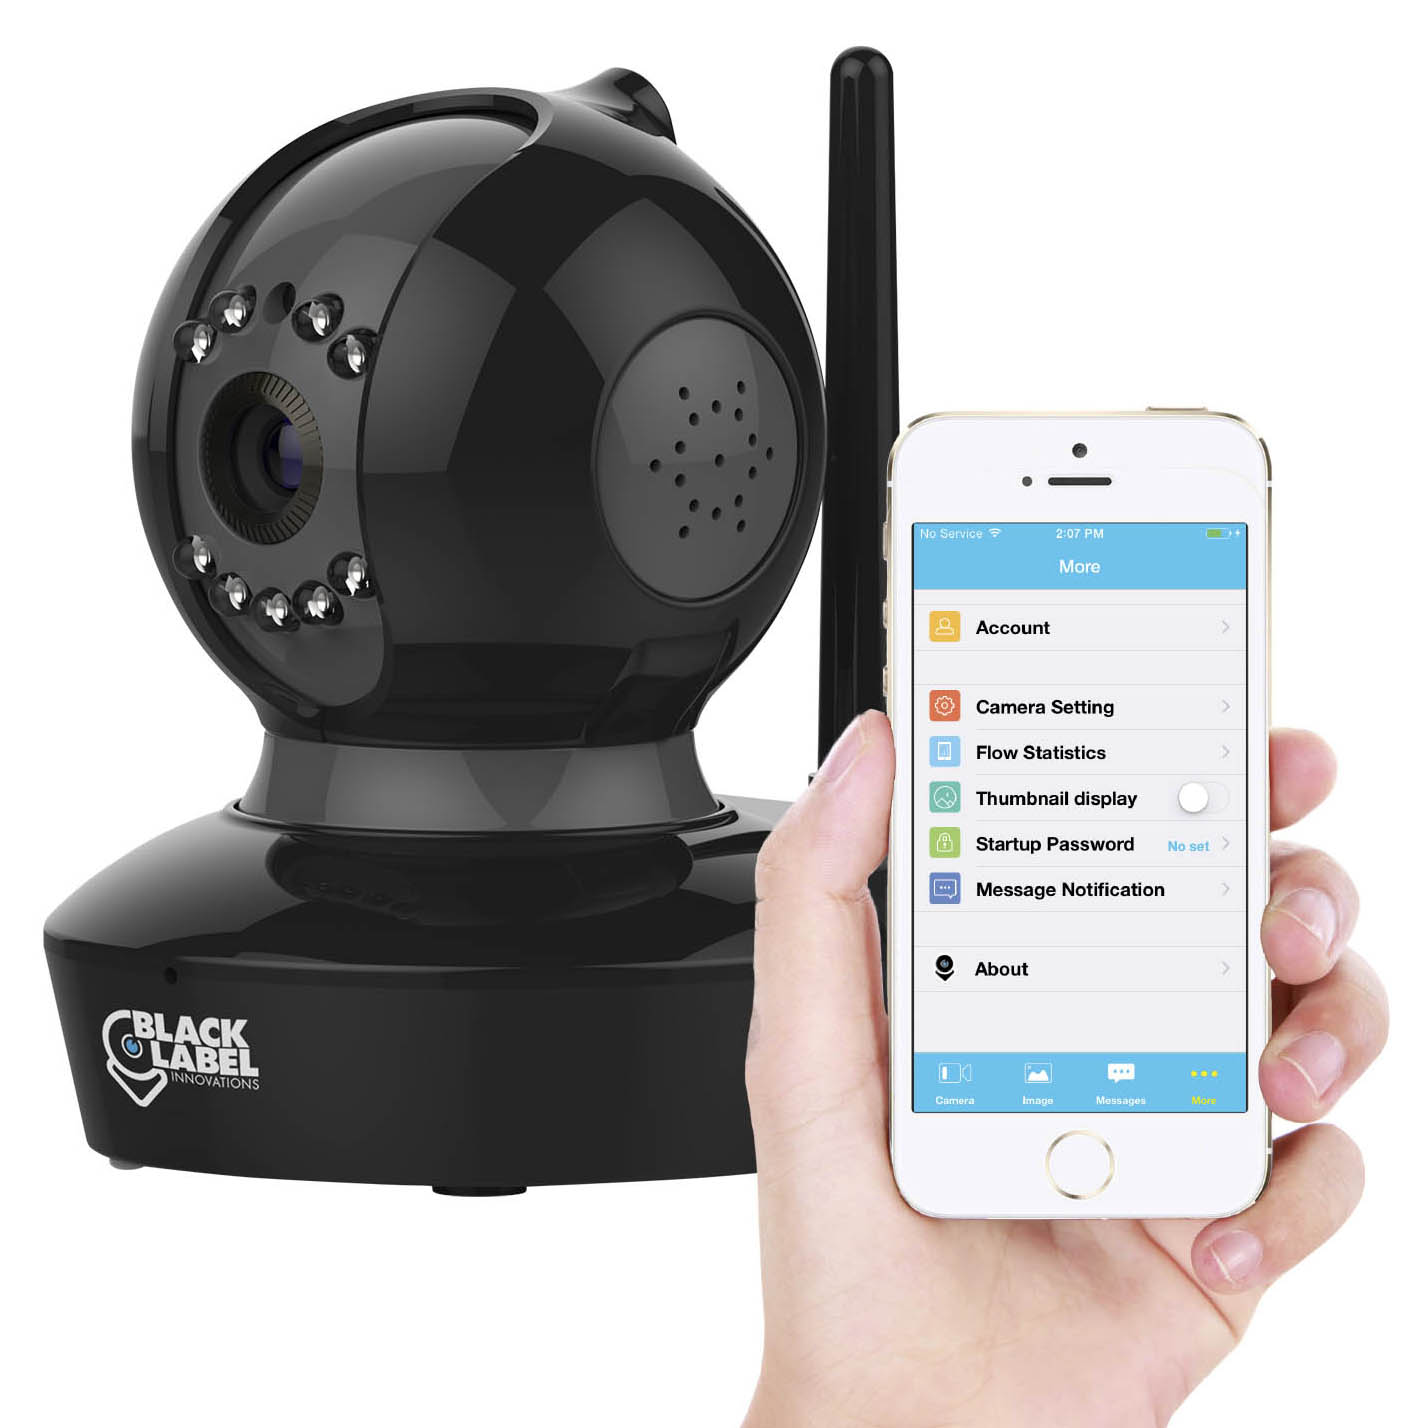 Black Label Cam Pro Full HD 1080P WiFi Surveillance Camera